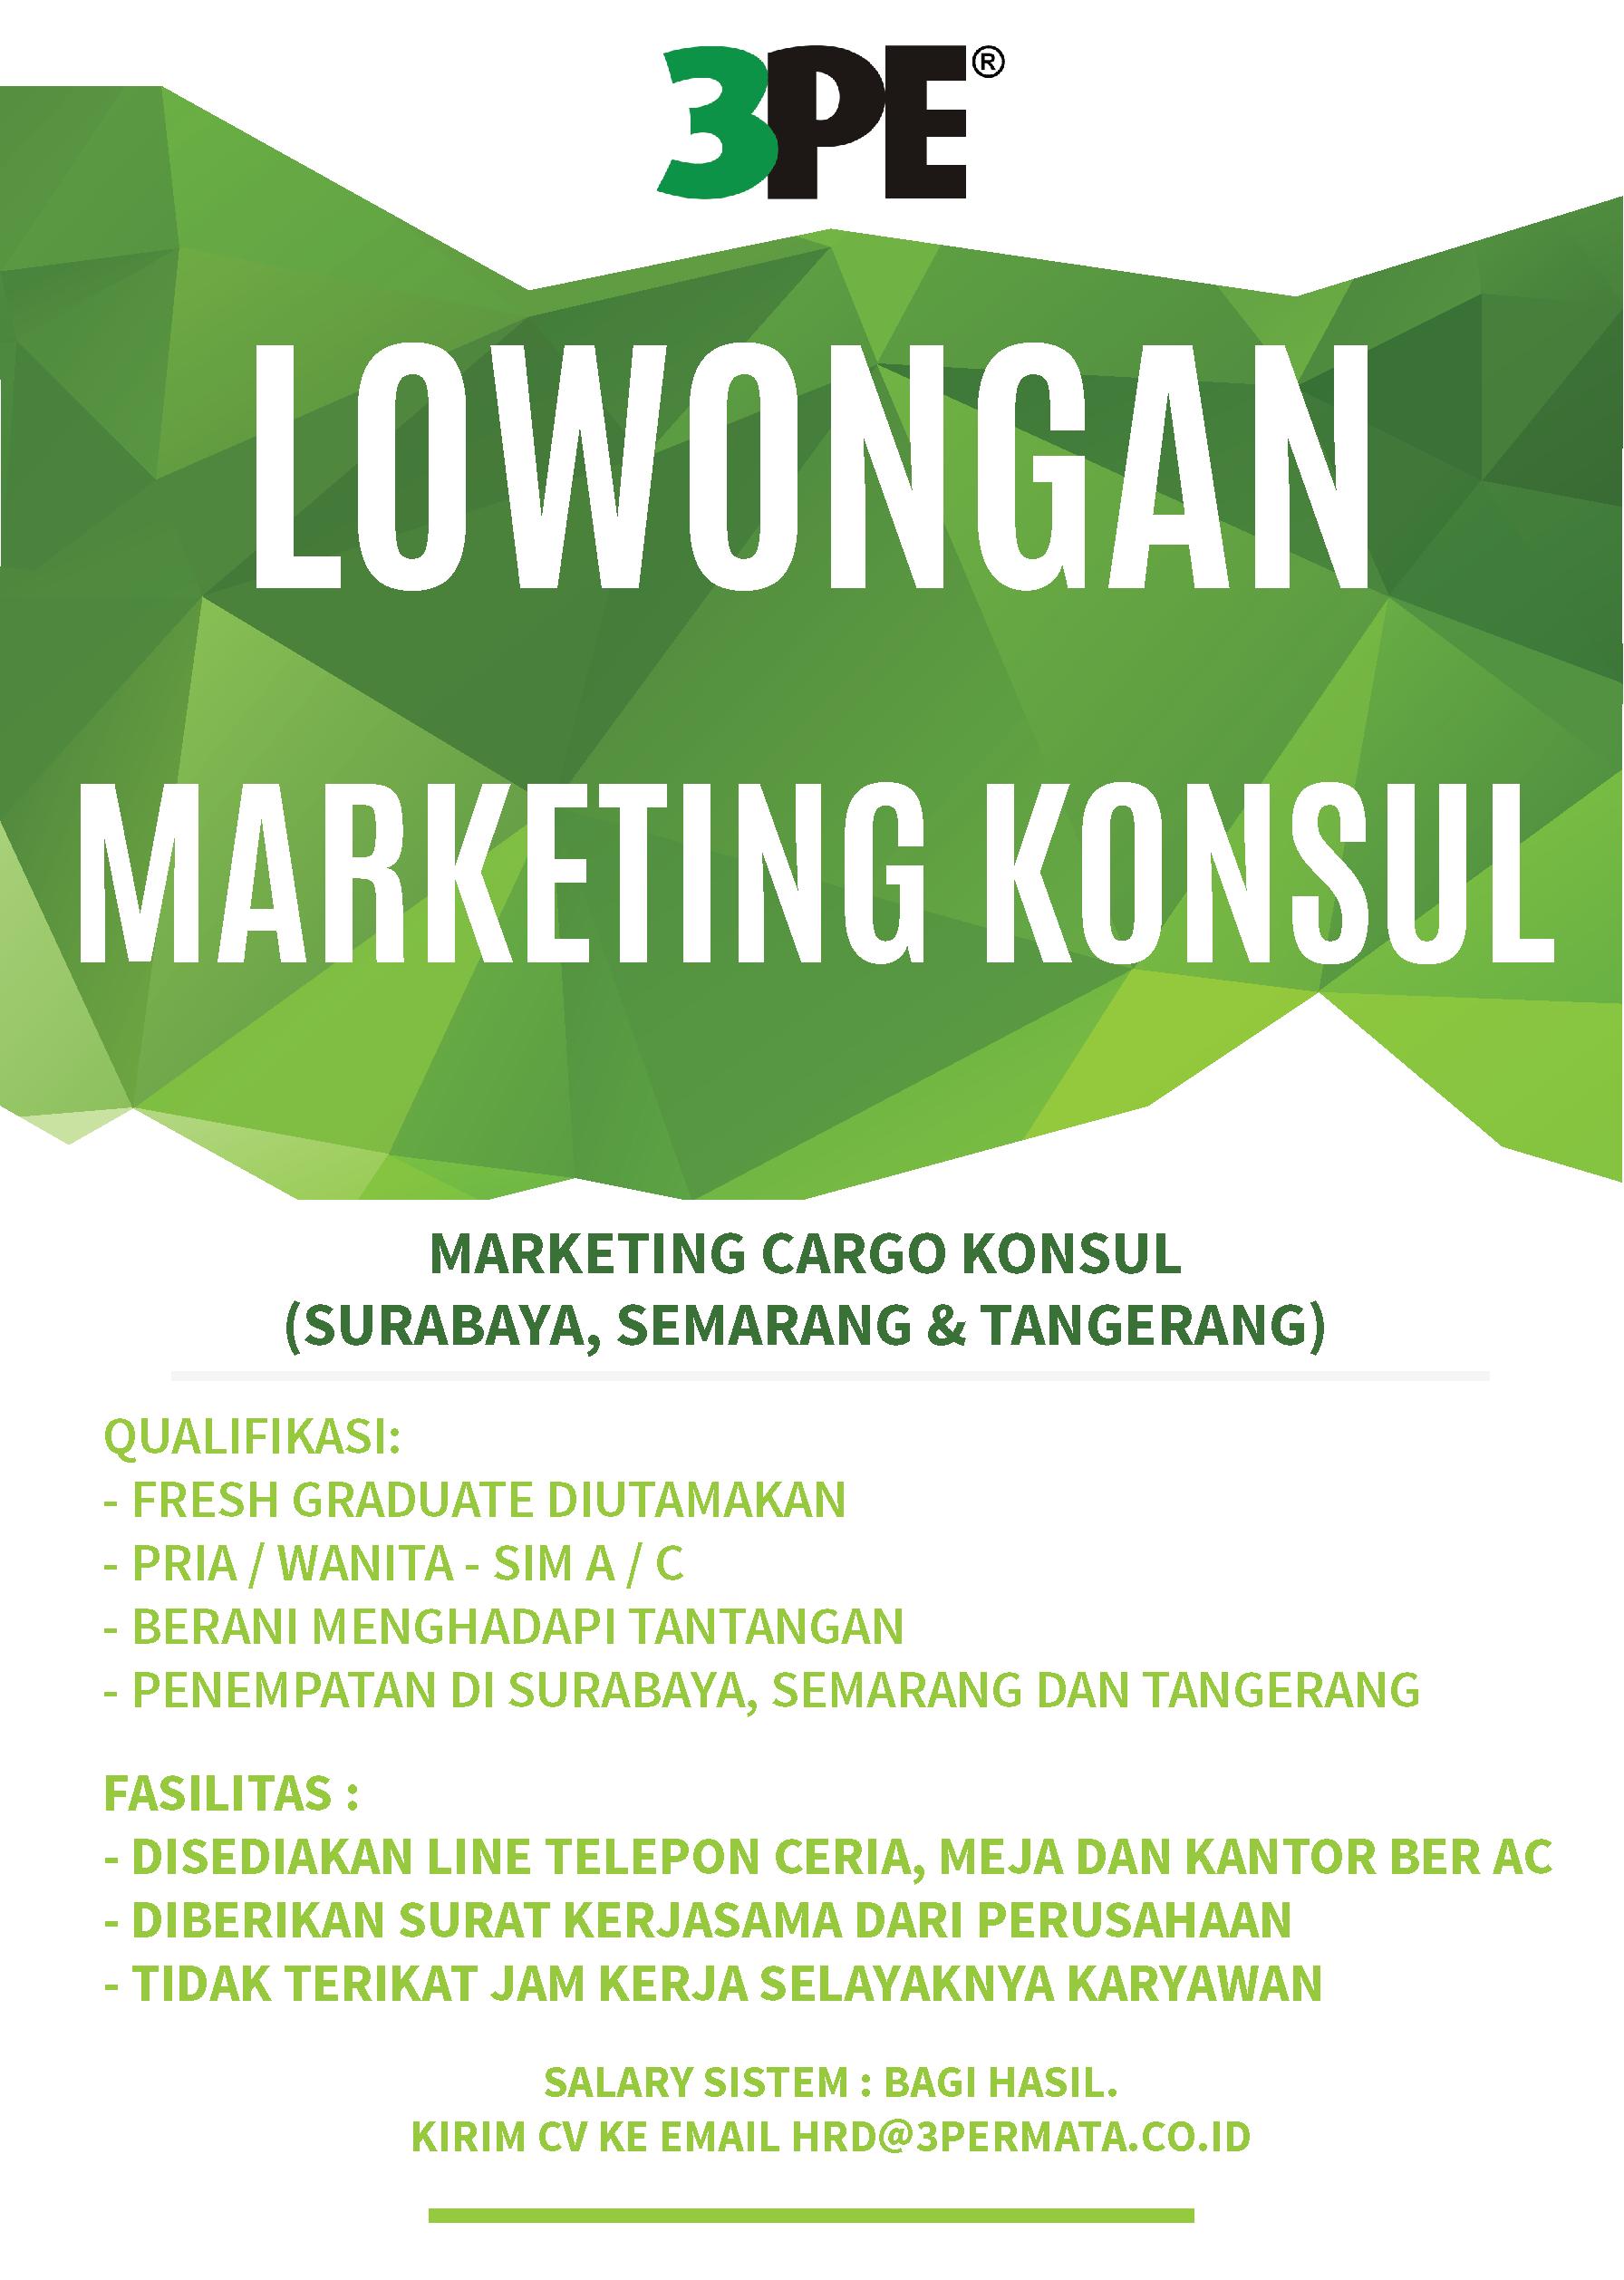 Lowongan Marketing Konsul